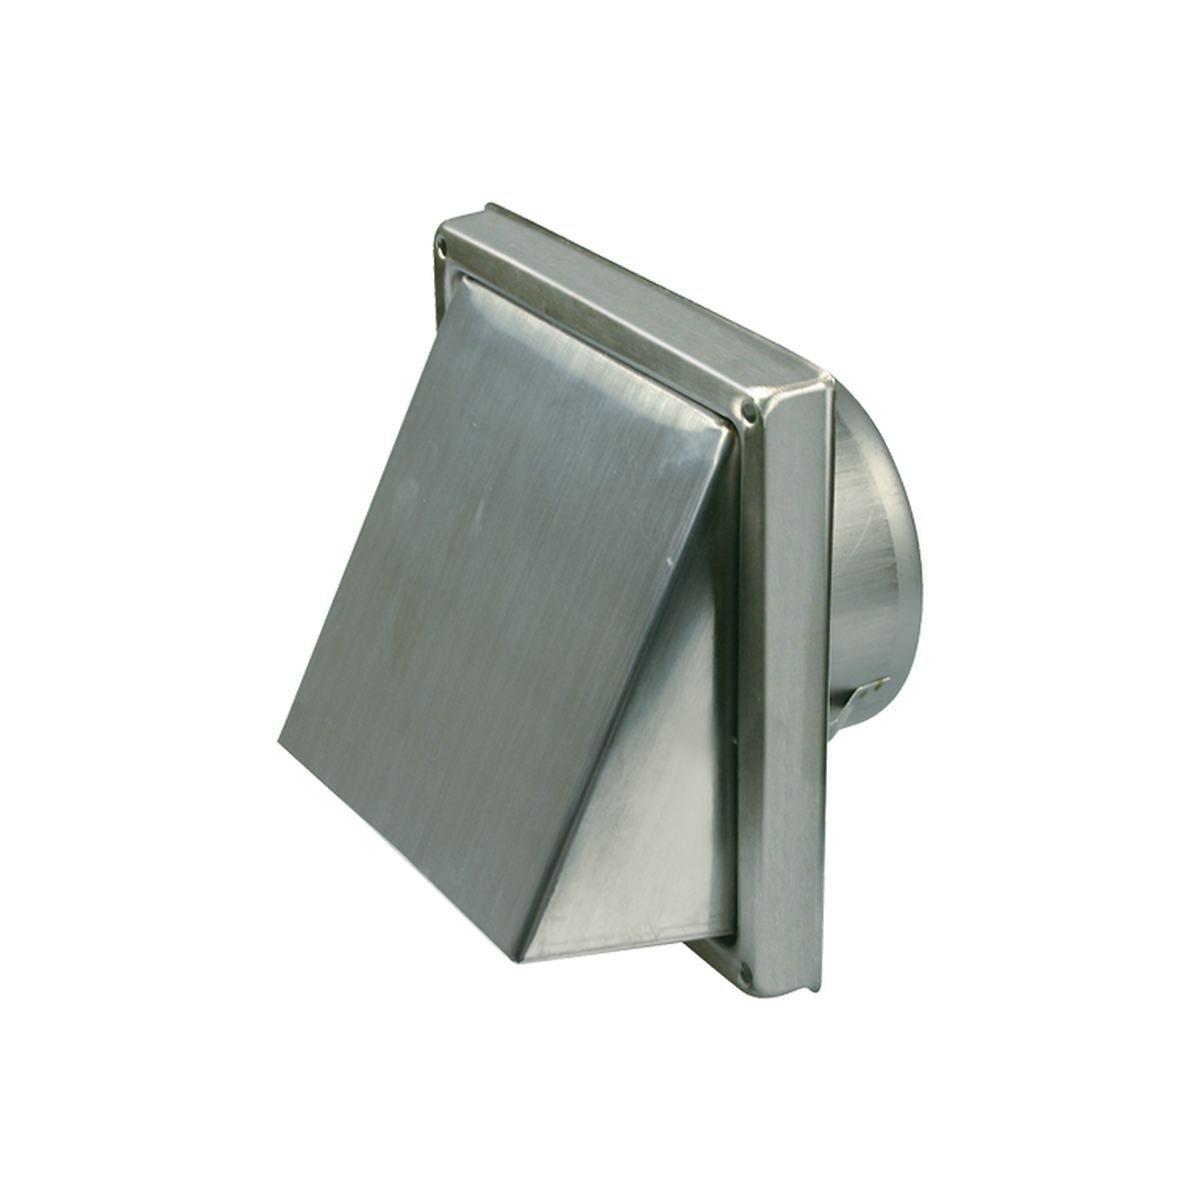 Klapventil Ø100 mm. rustfri stål